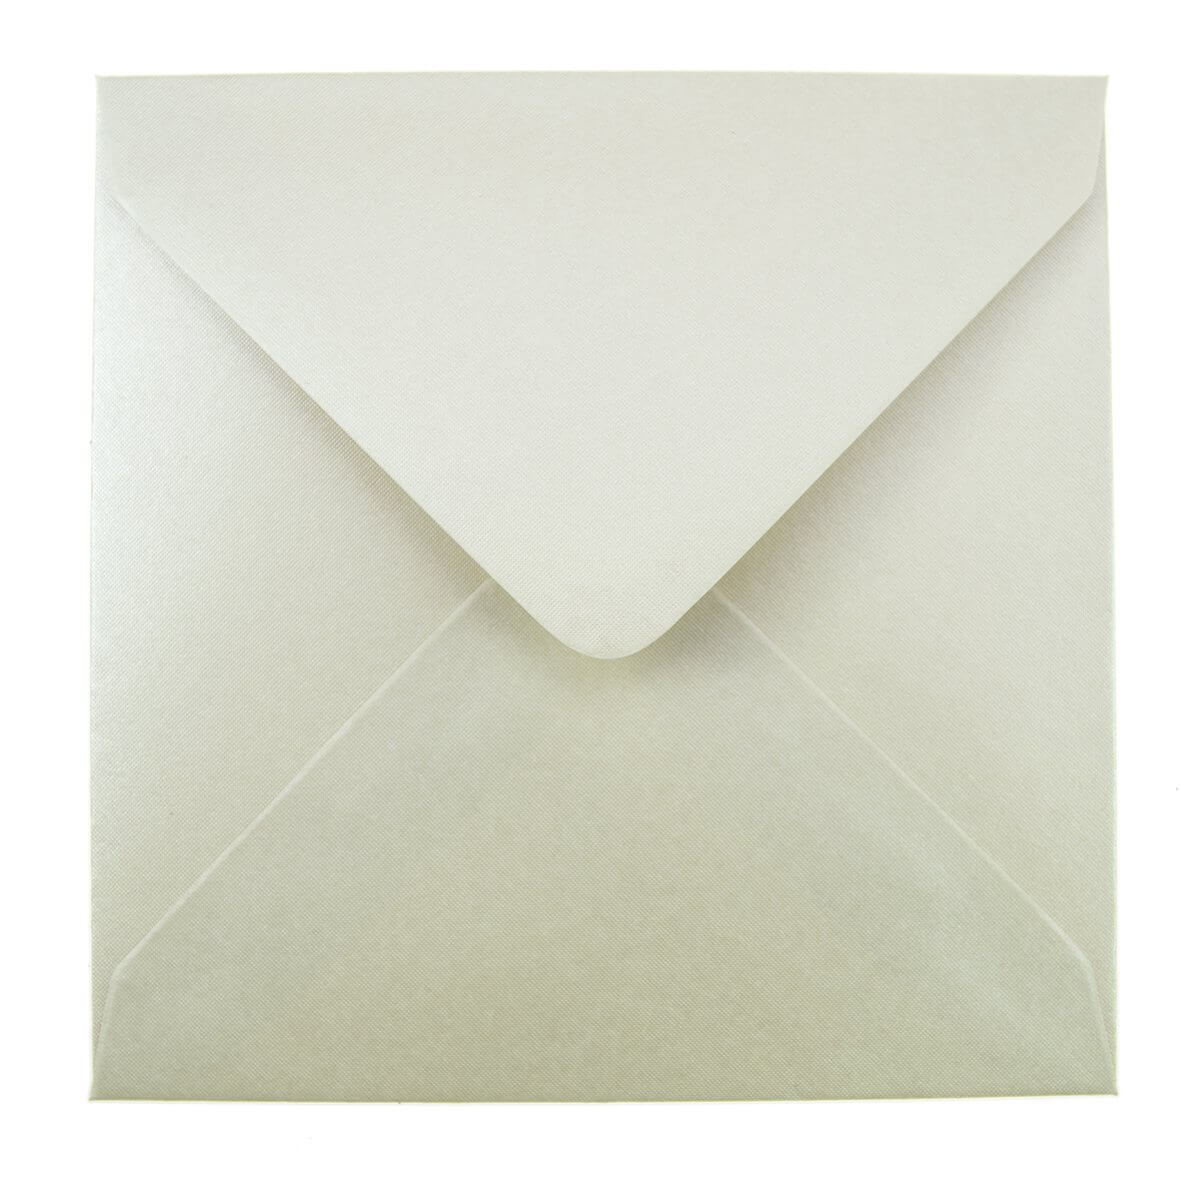 Fabrique Ivory Large Square 155mm Envelope